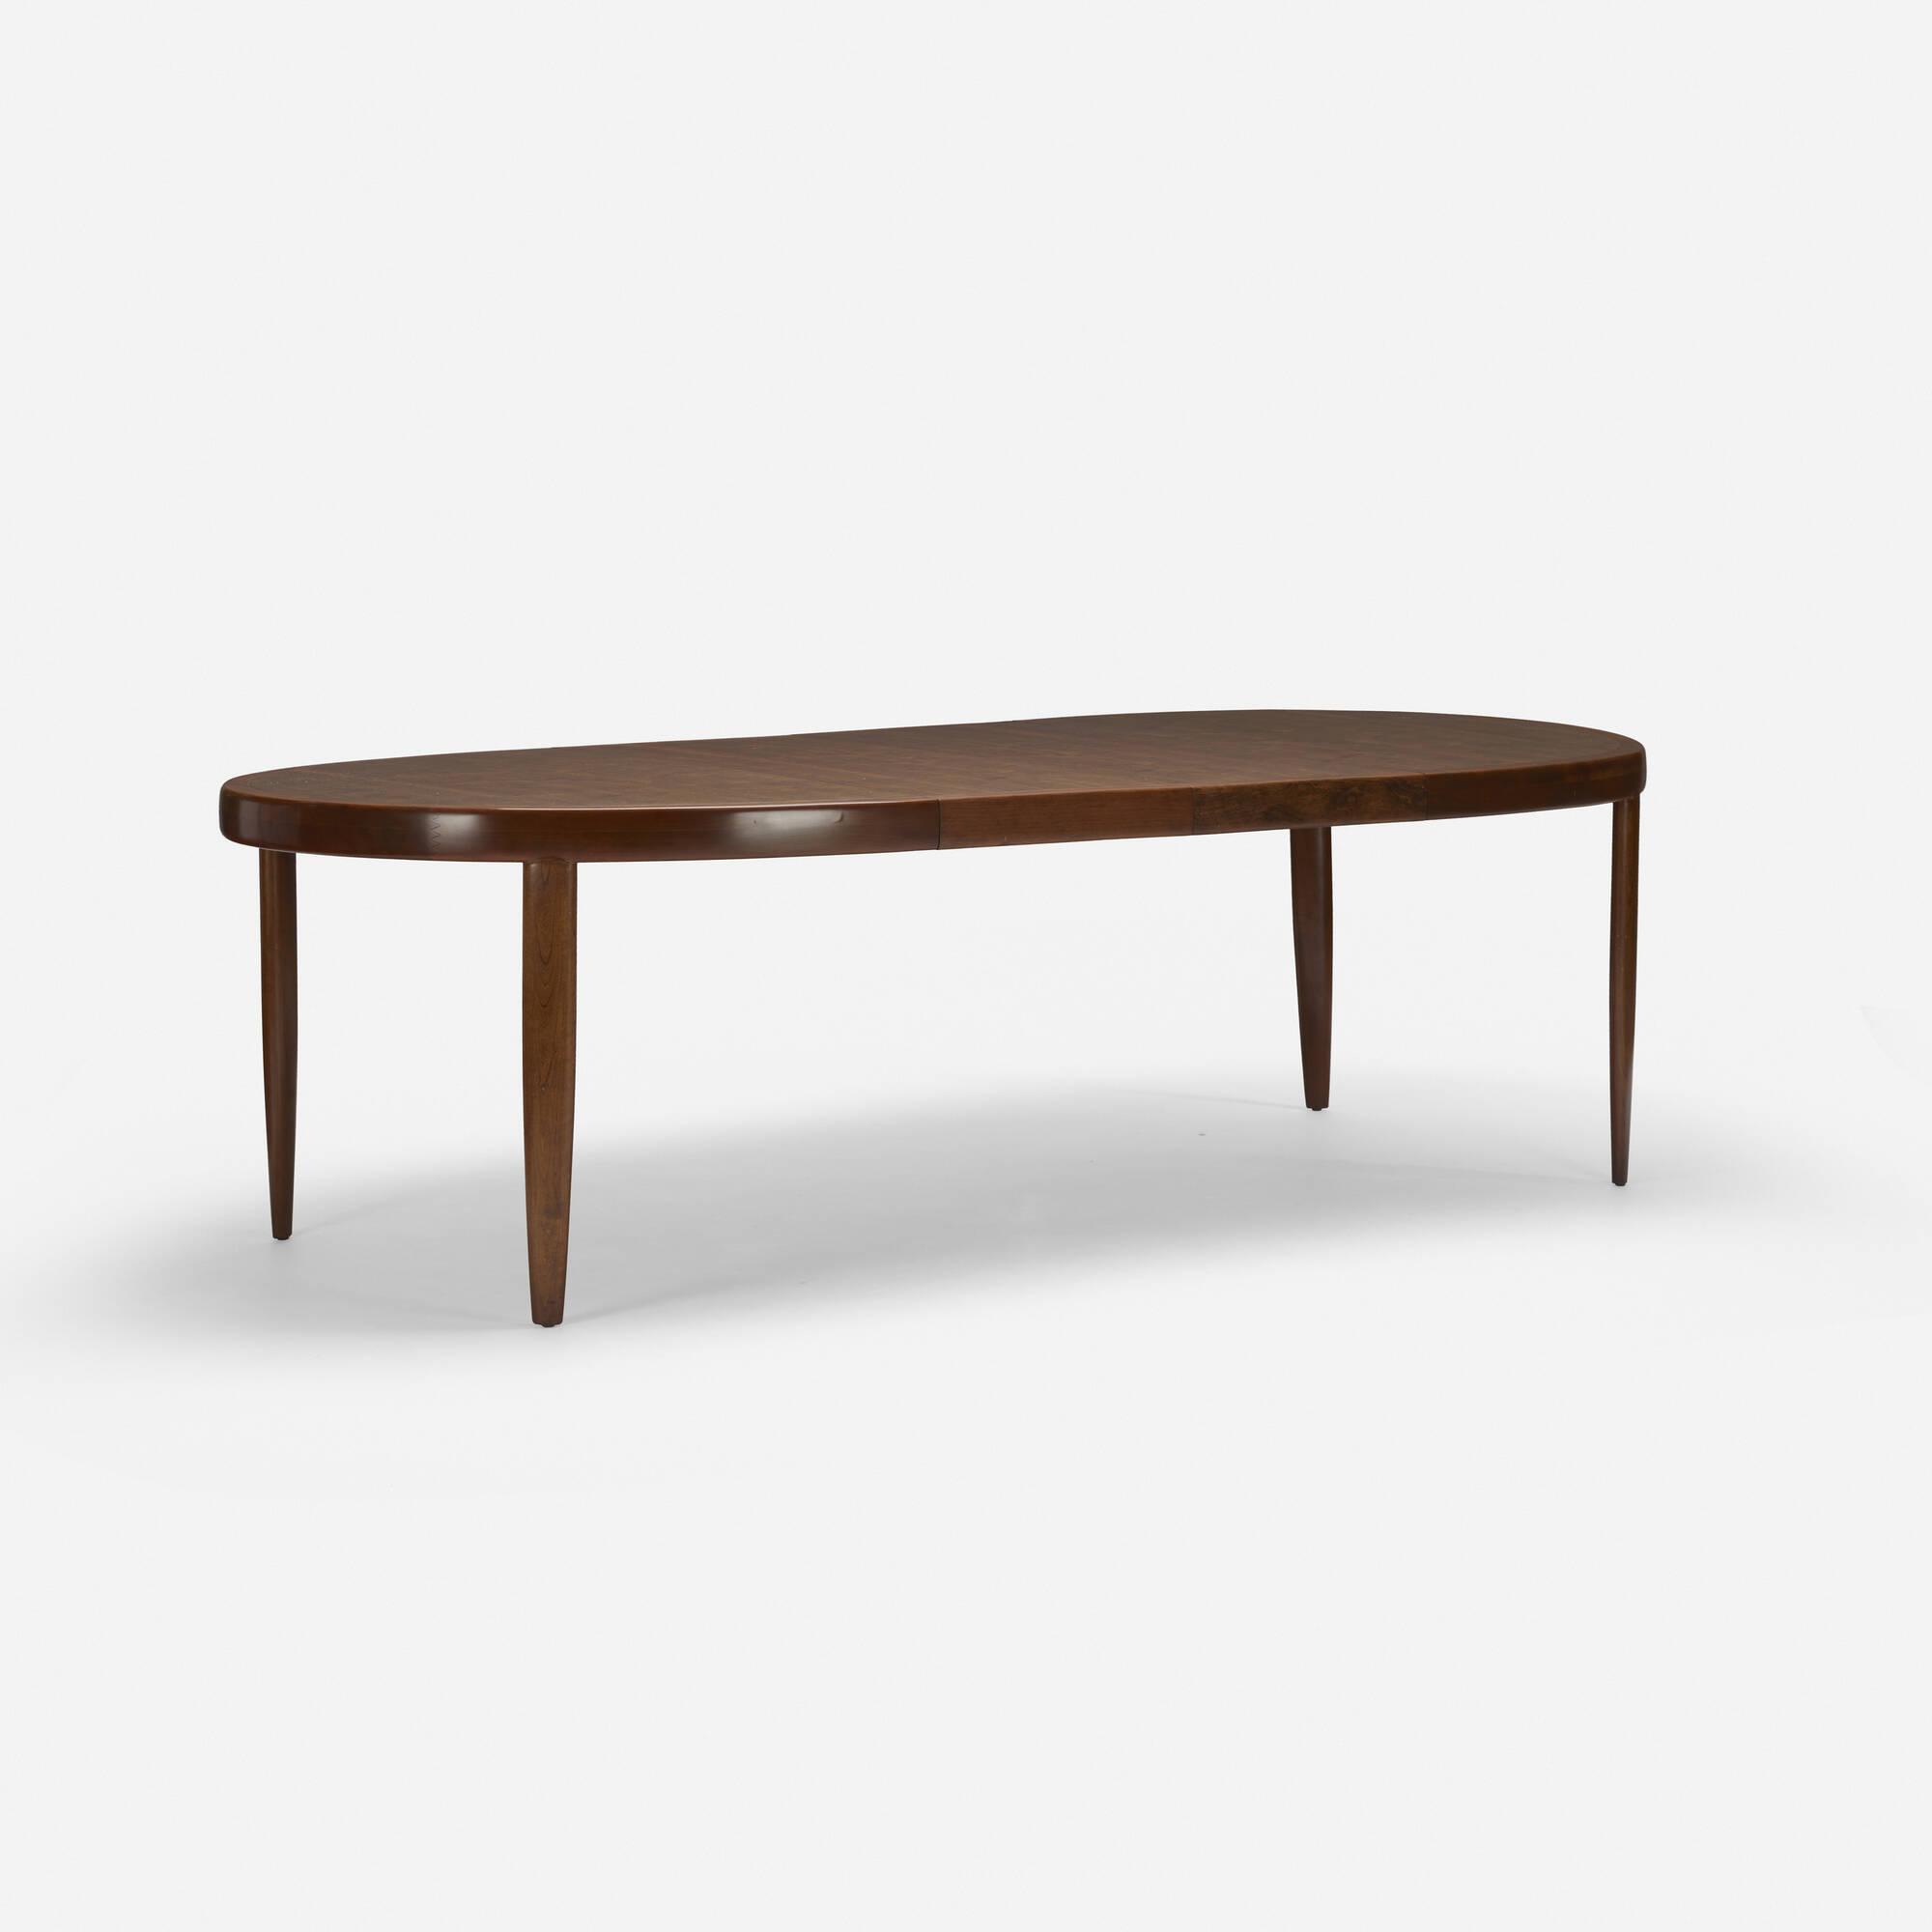 185: George Nakashima / Origins dining table, model 269 (1 of 3)